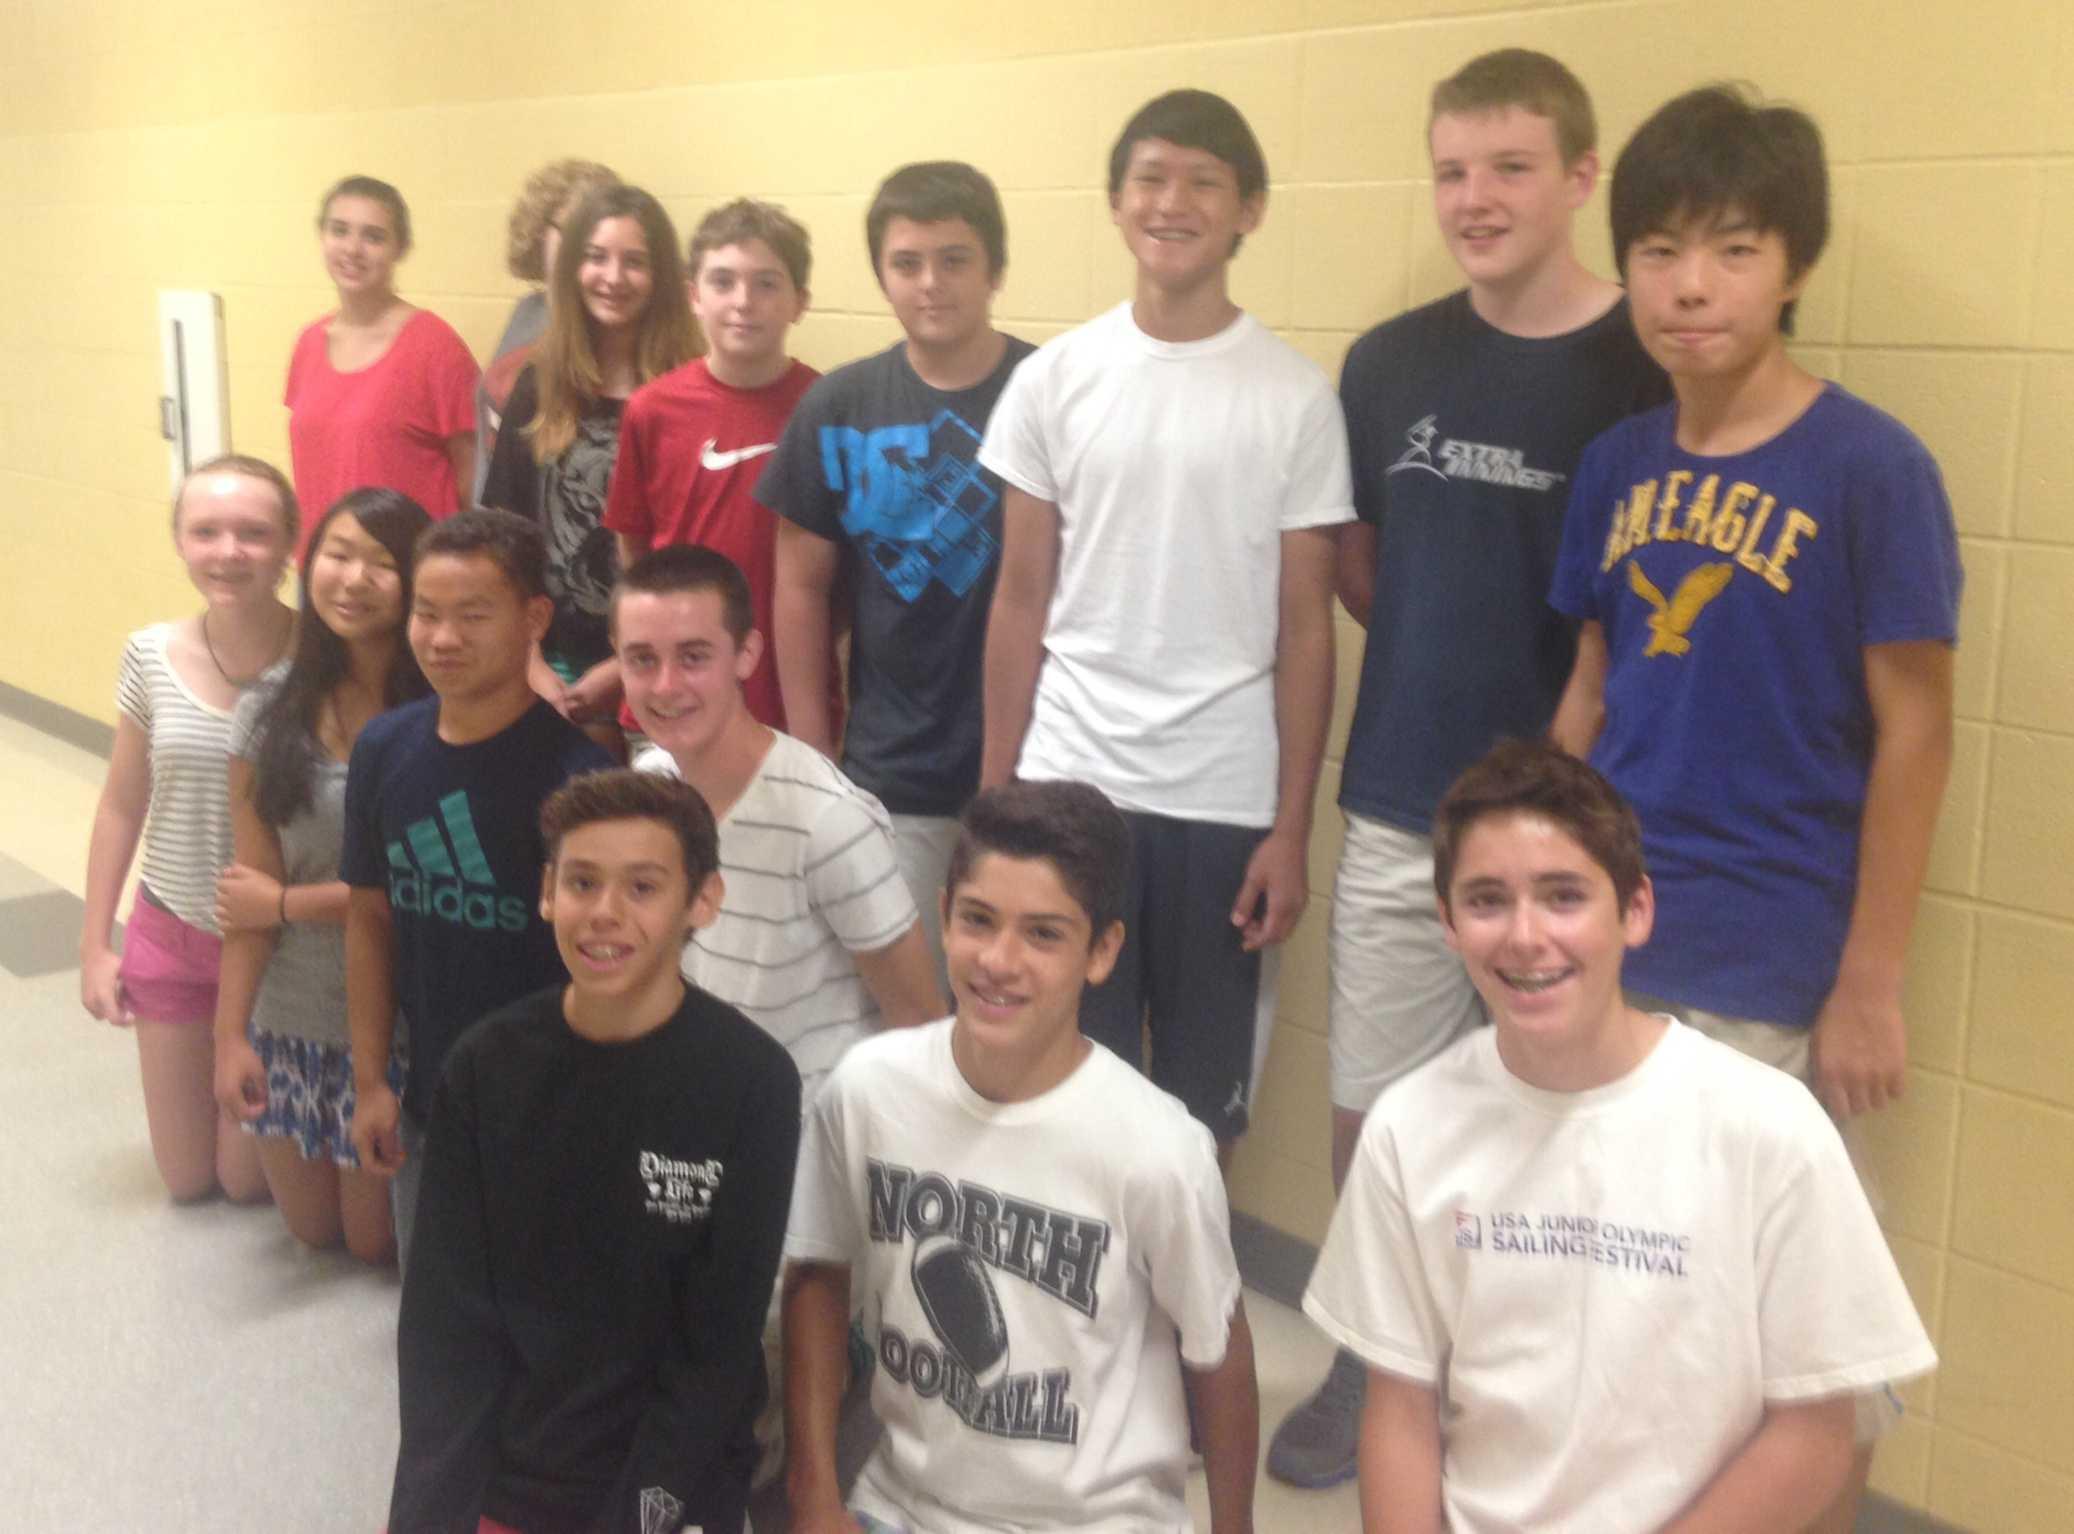 Mr. Mark DeLucia's freshman advisory at NKHS